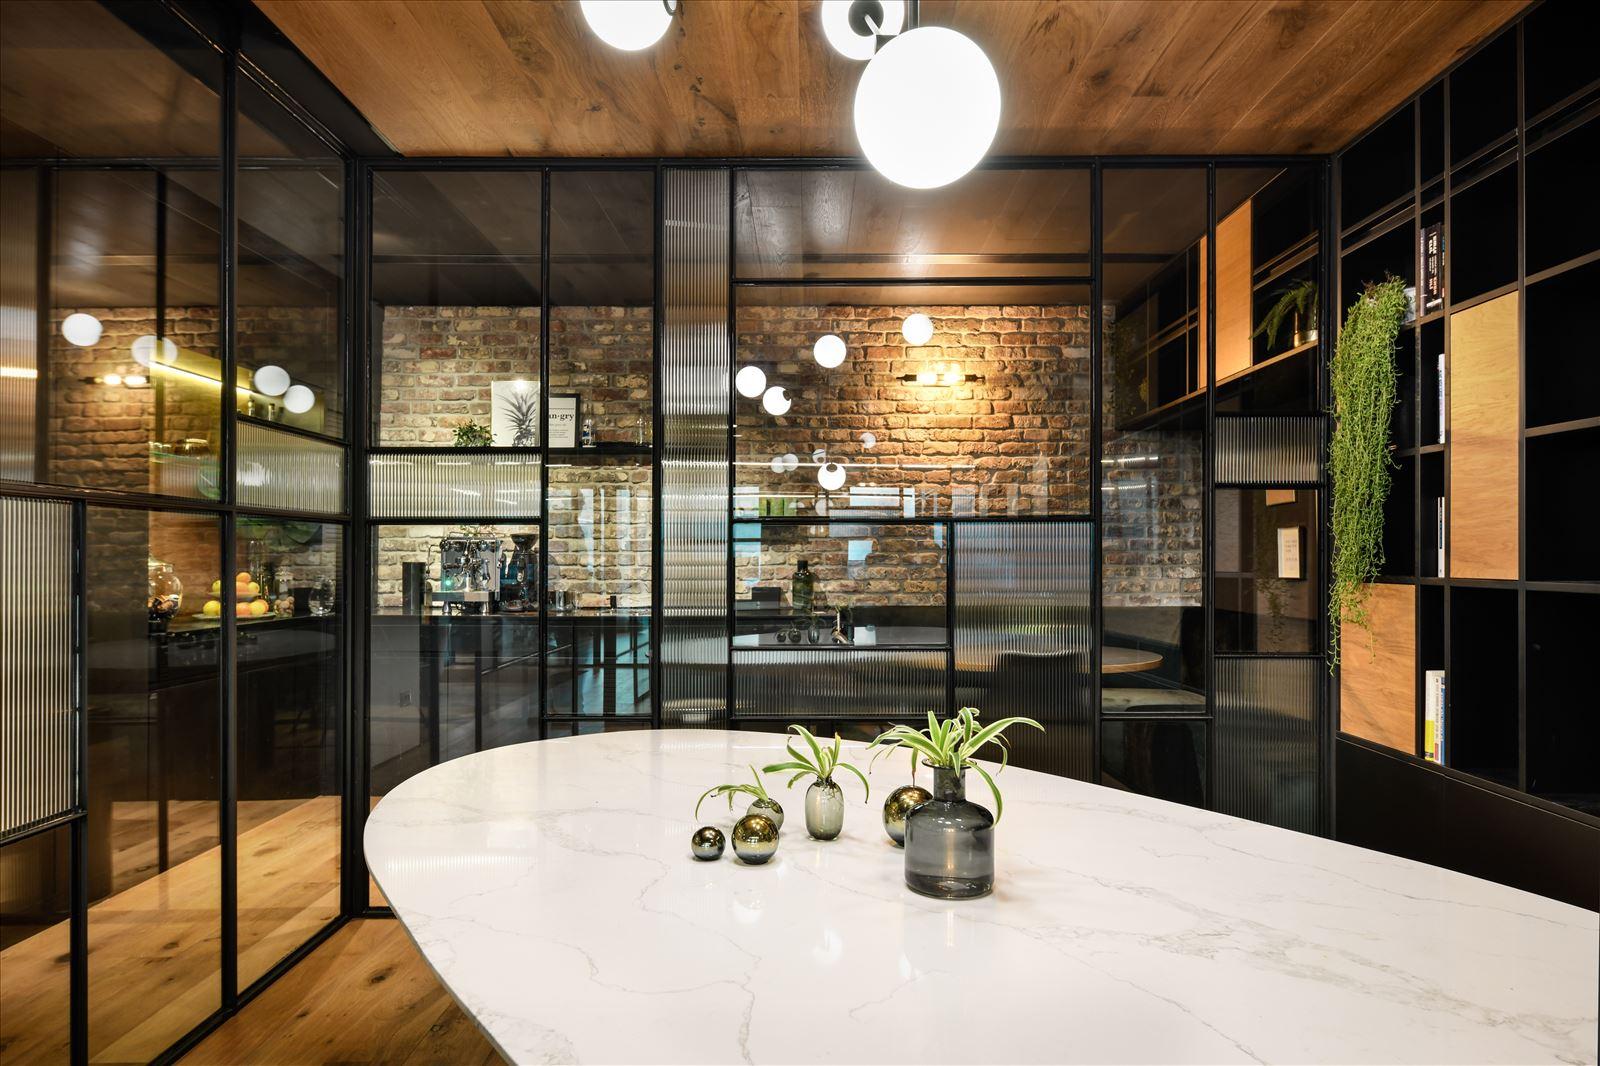 Arbitrage office גוף תאורה גדול מעל שולחן הישיבות בחדר נעשה על ידי דורי קמחי